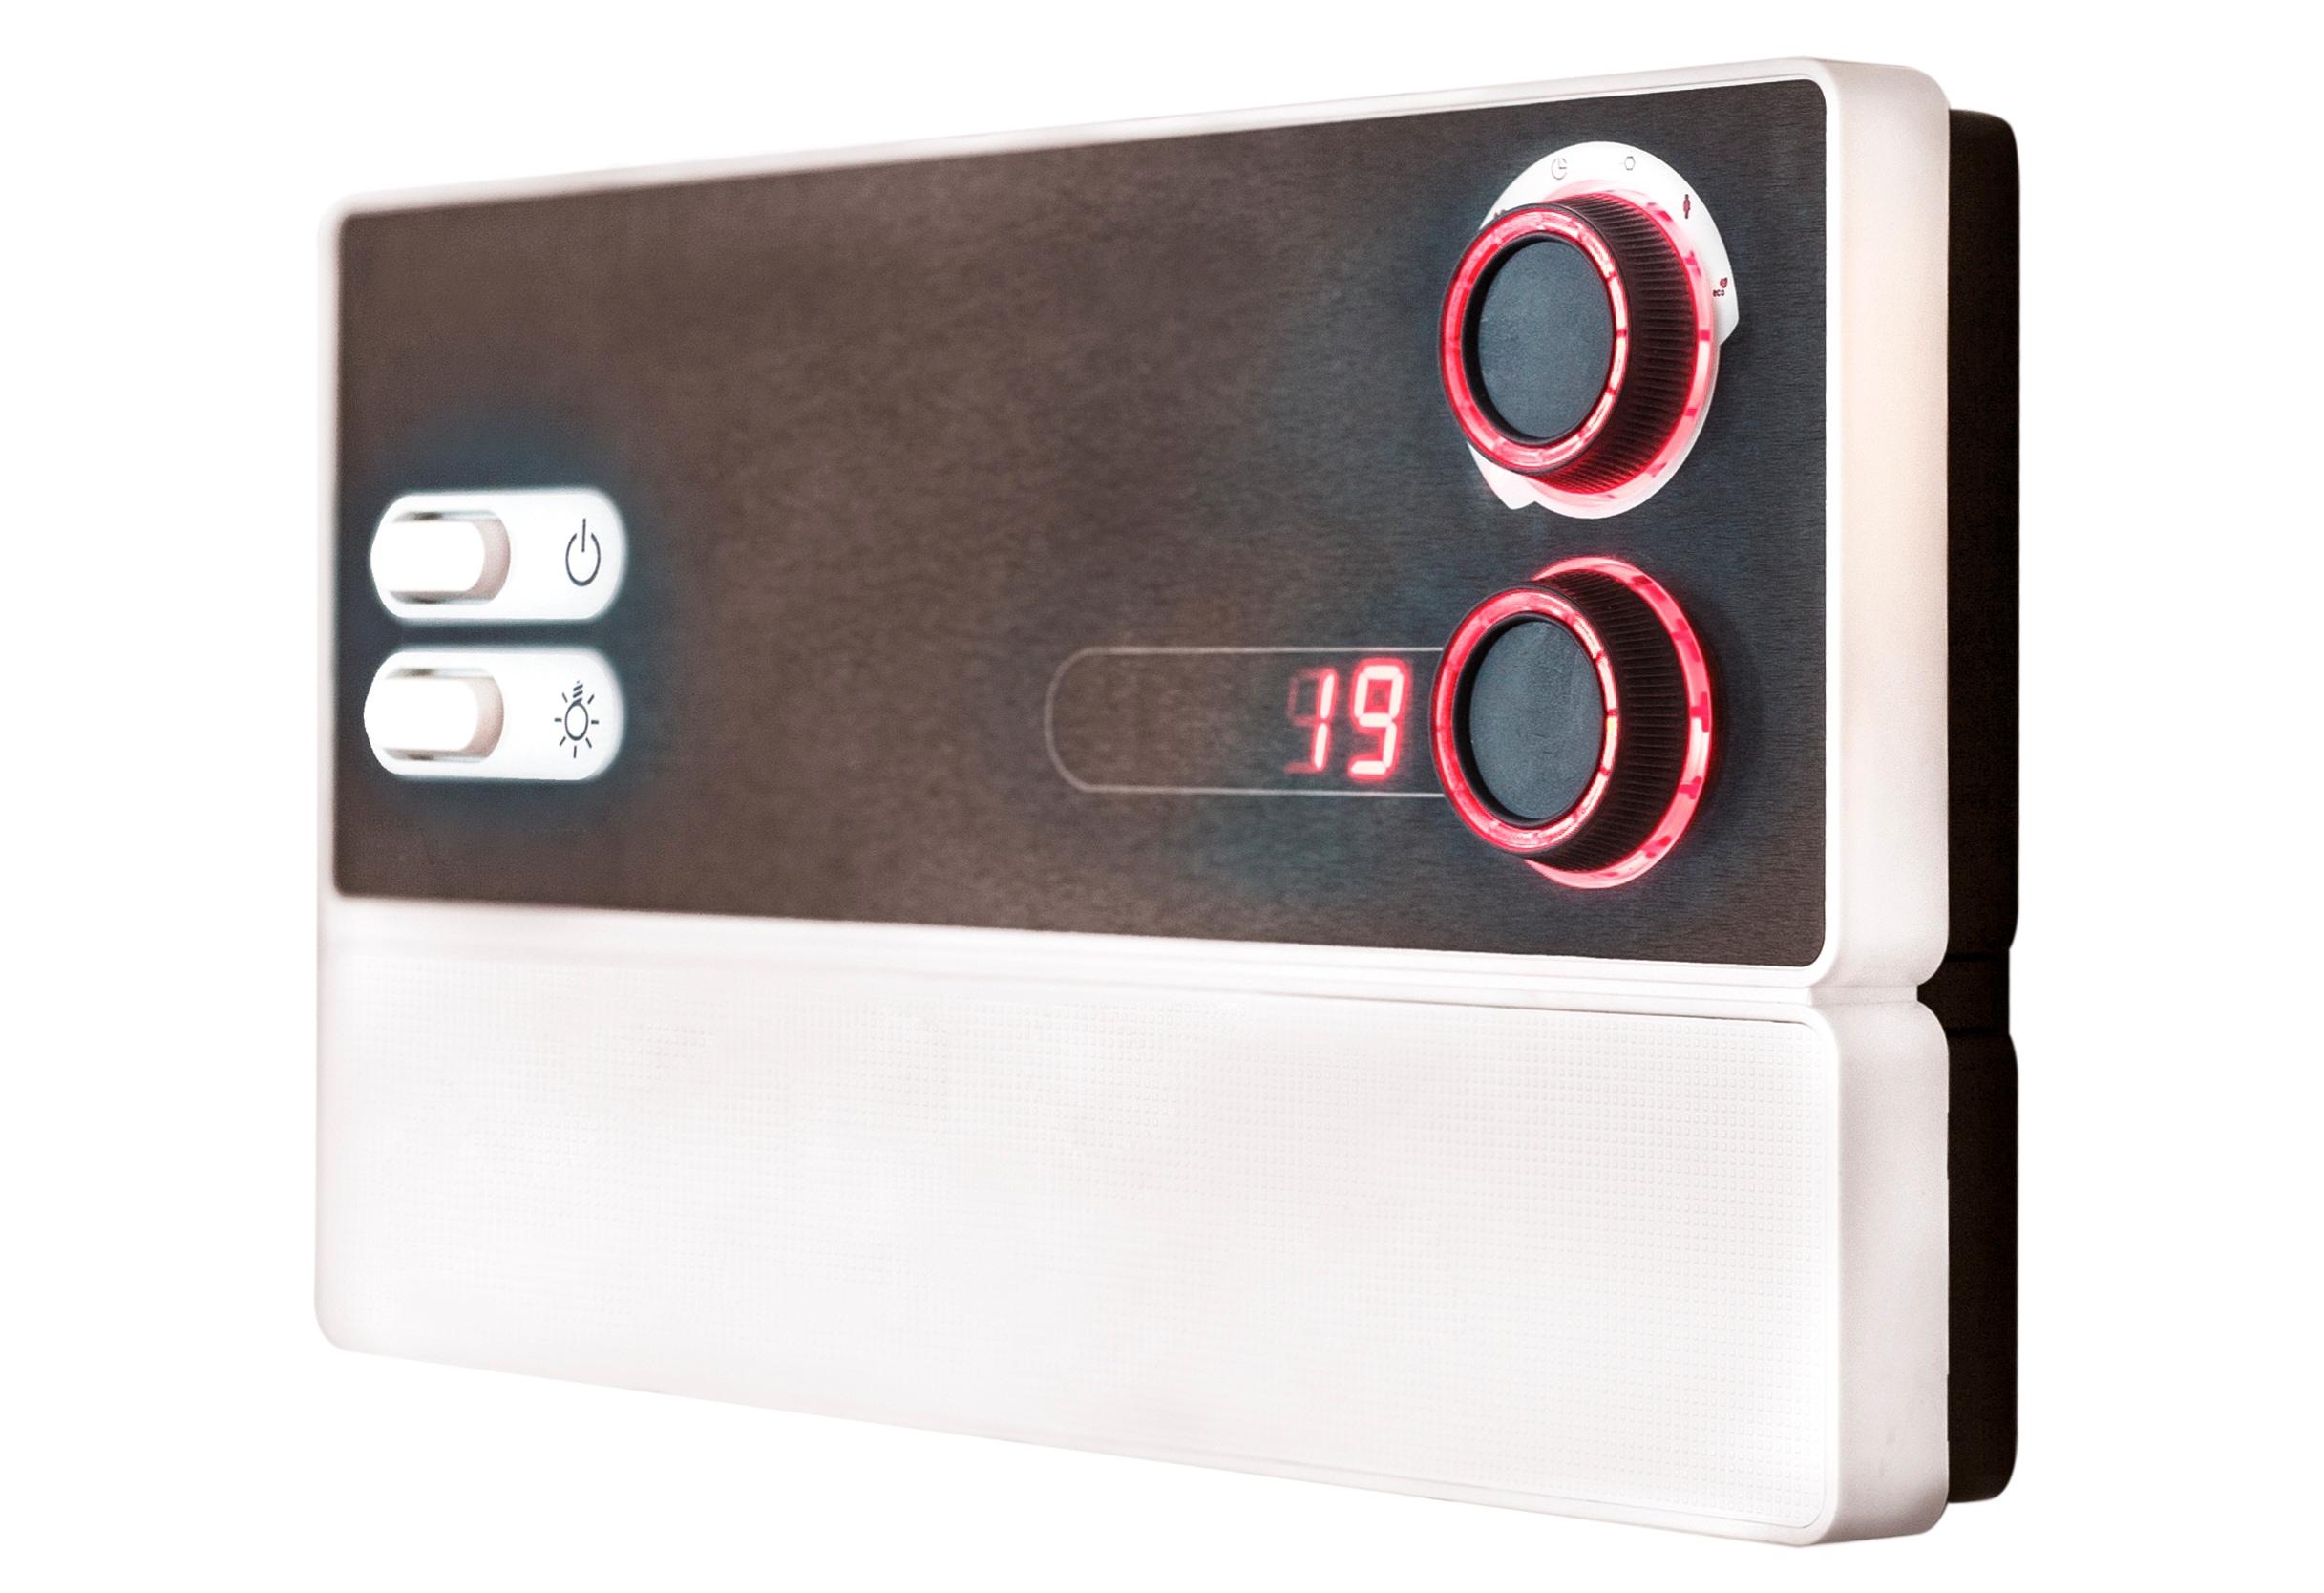 KARIBU Sauna-Steuergerät Multi für Strahler & Öfen